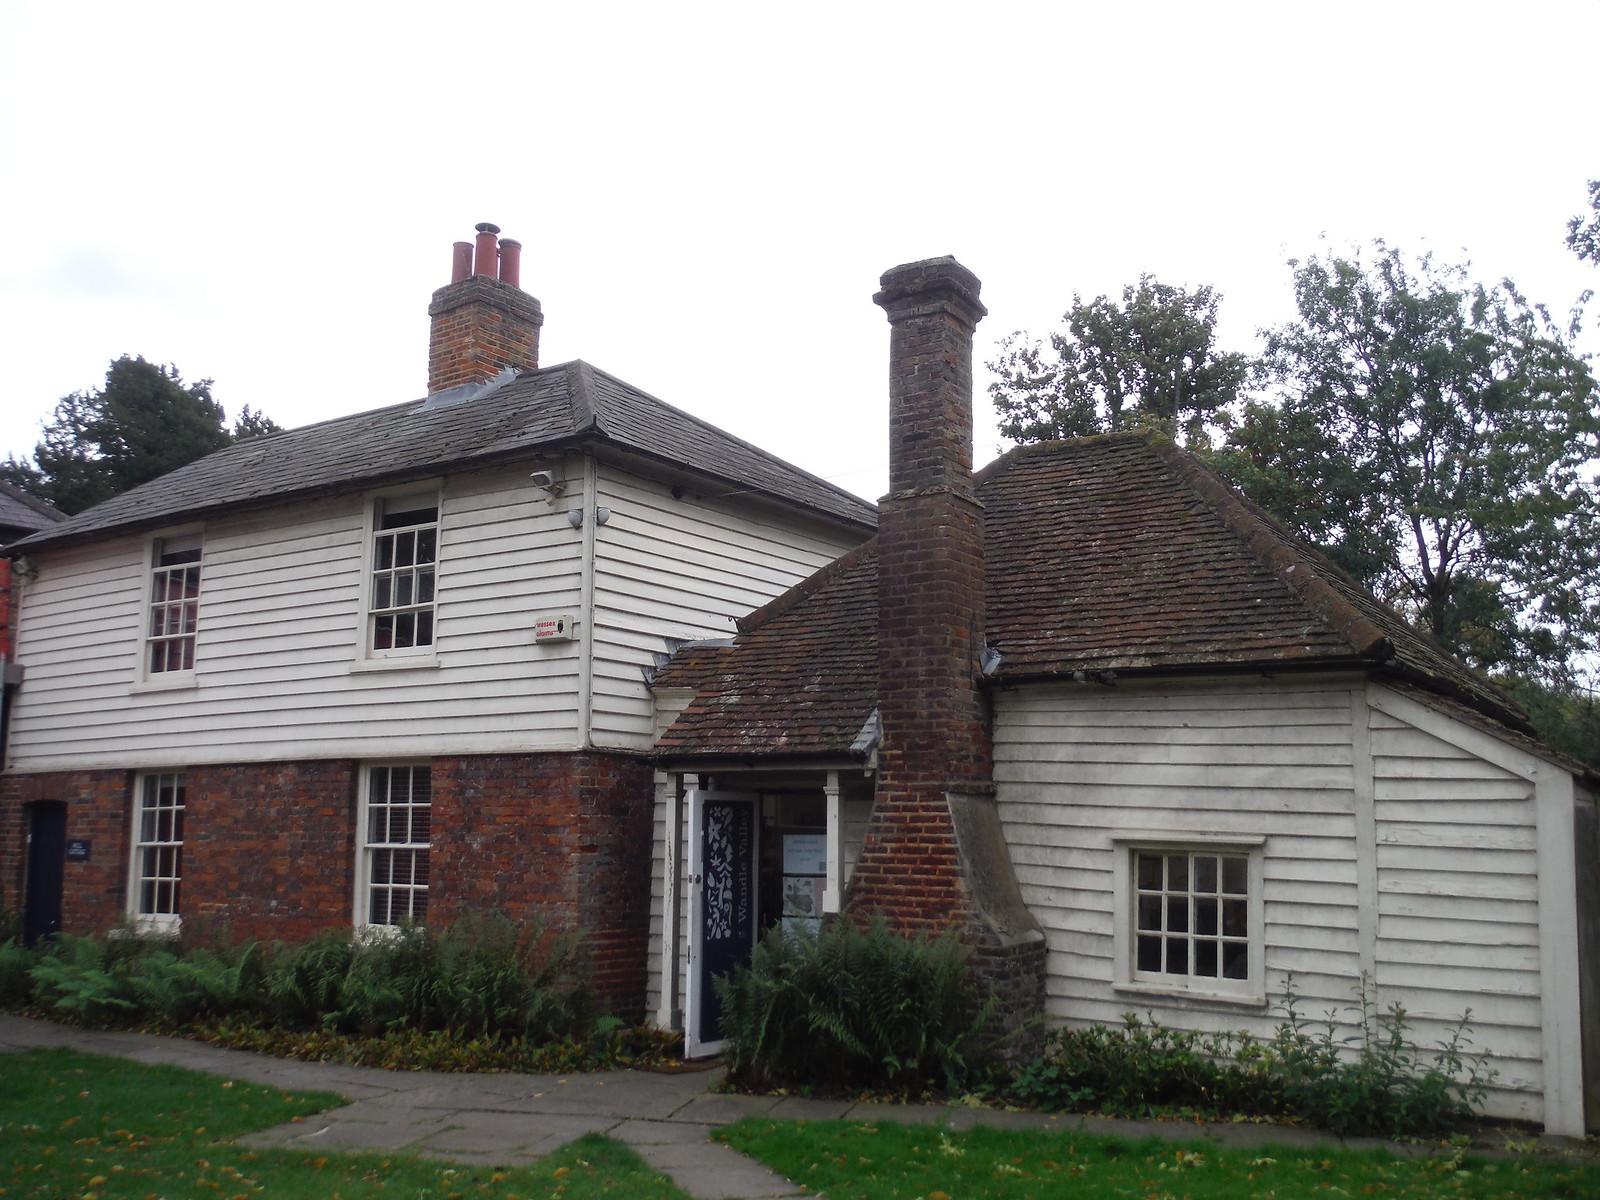 Snuff Mill Cottage, Morden Hall Park SWC Walk Short 13 - Morden Hall Park and Merton Abbey Mills